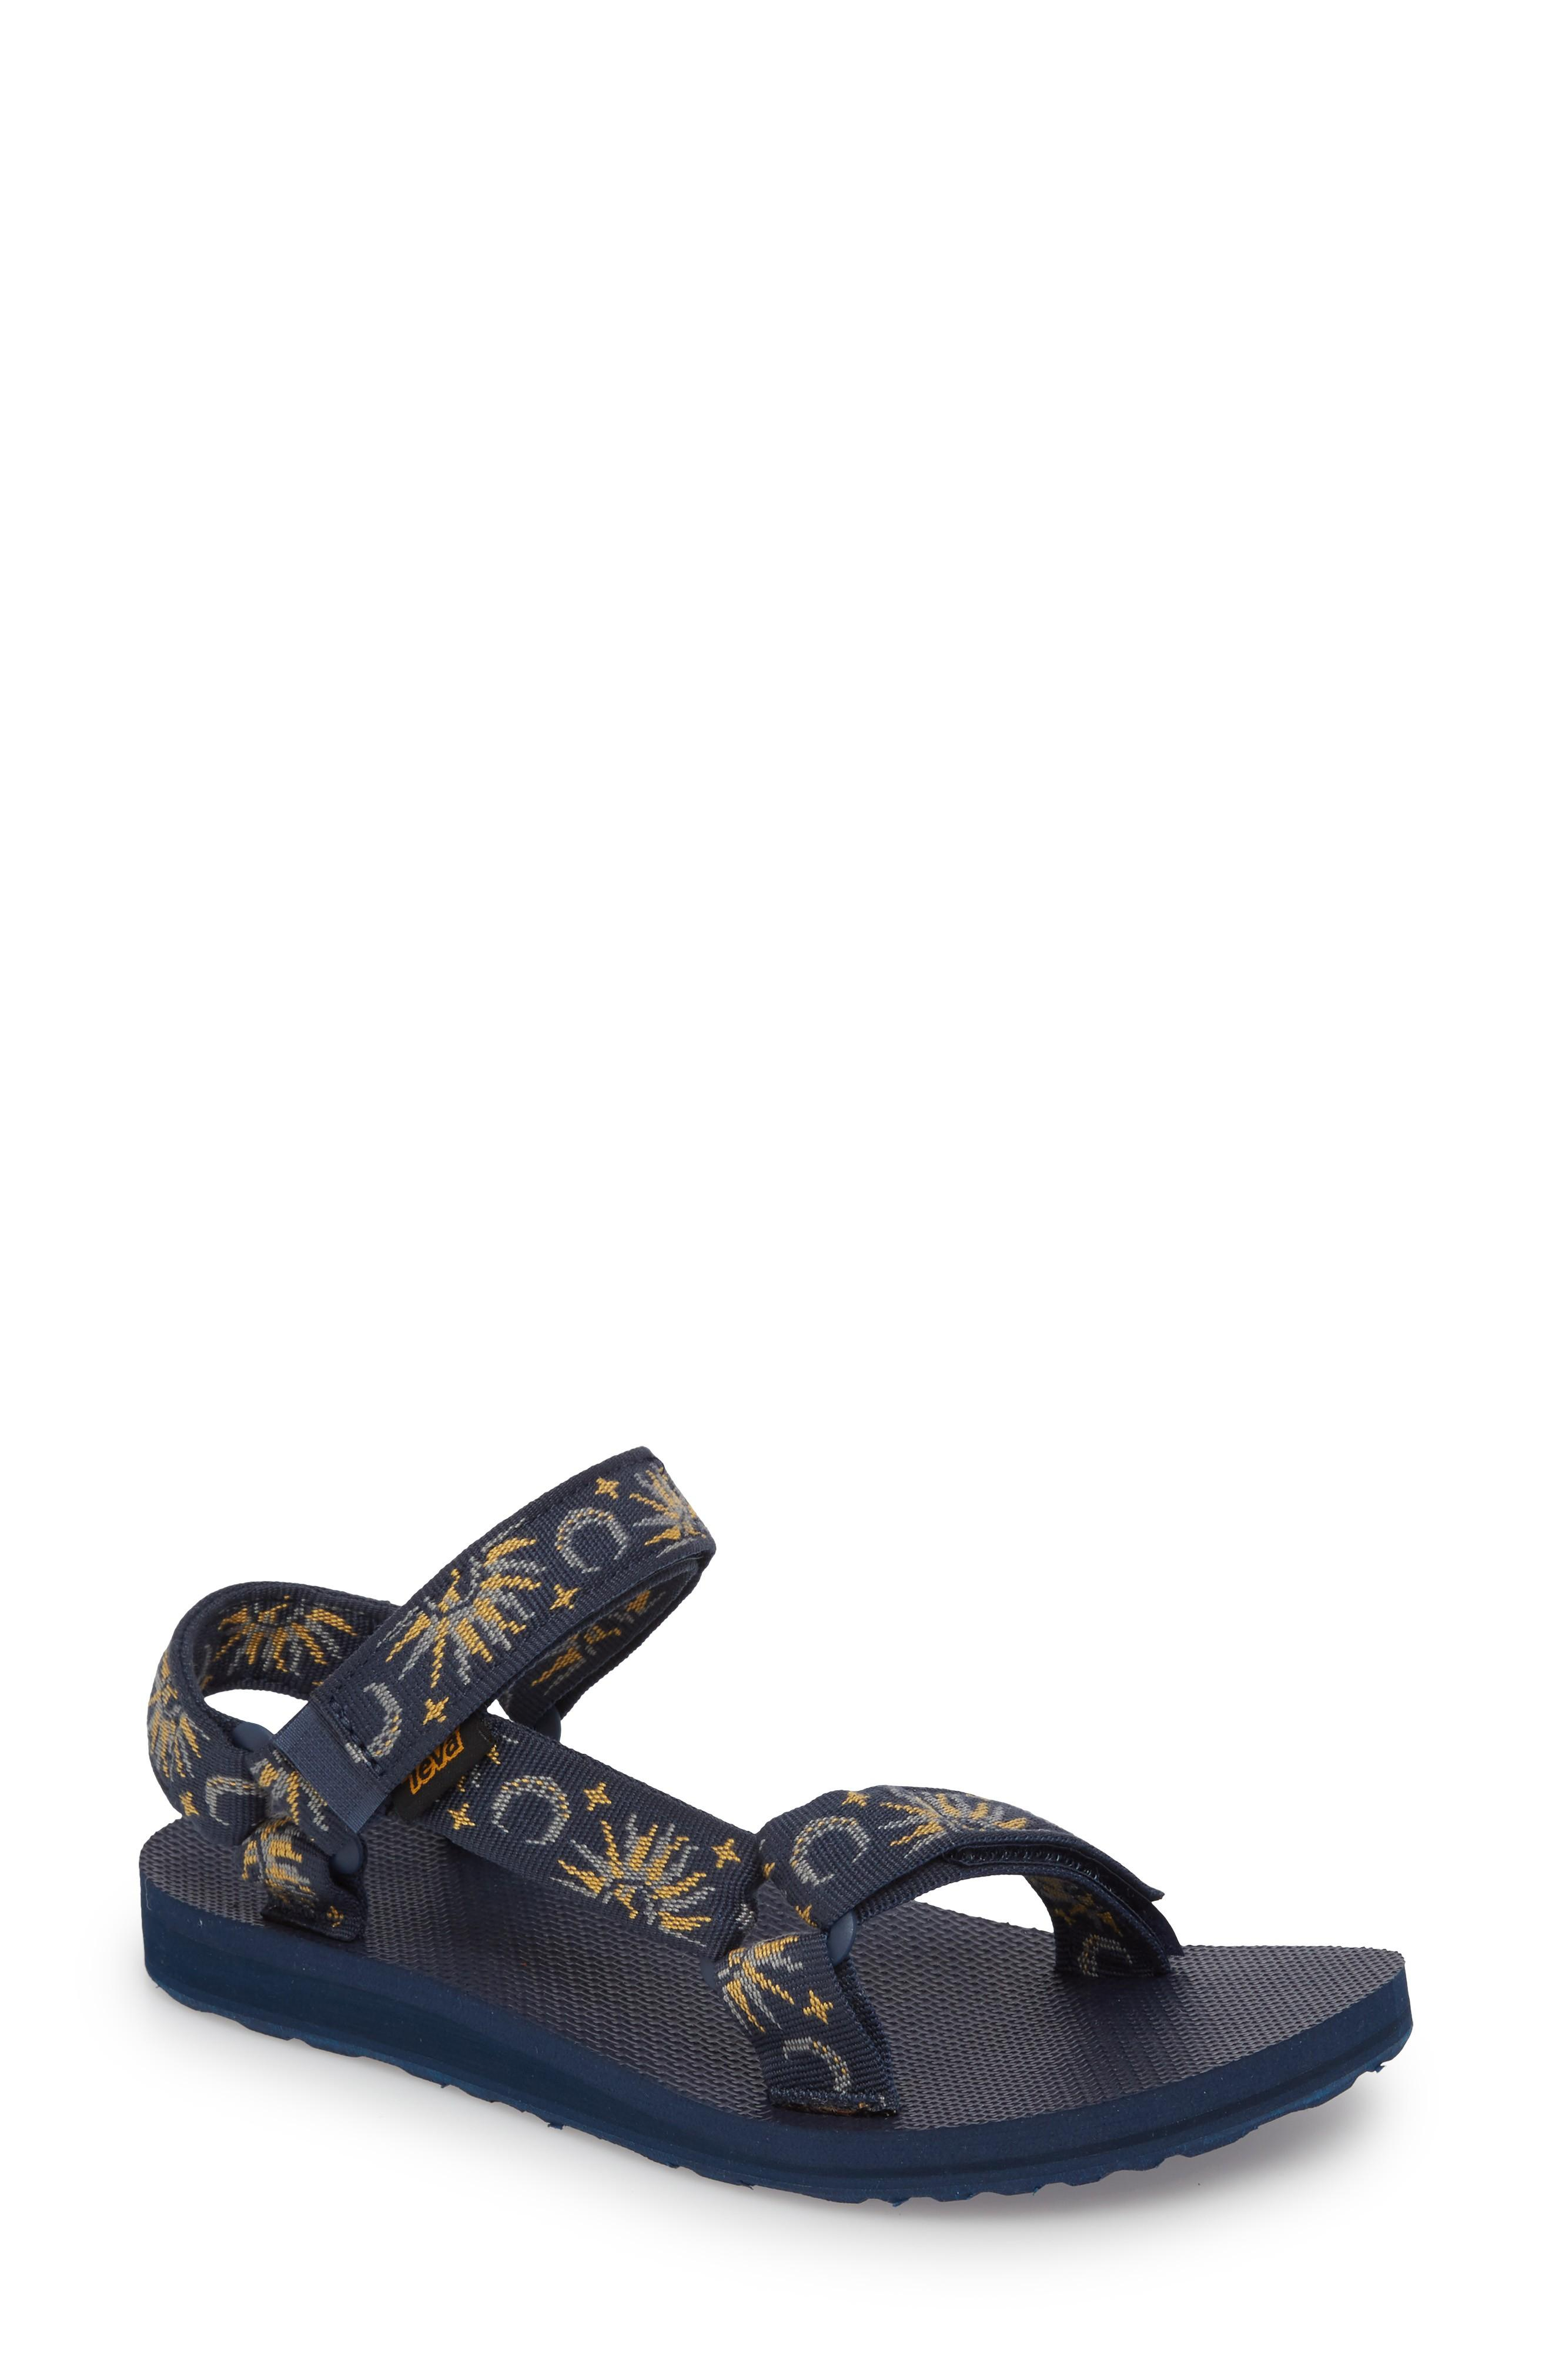 58d26f11121d22 Teva  Original Universal  Sandal In Sun And Moon Insignia Blue ...